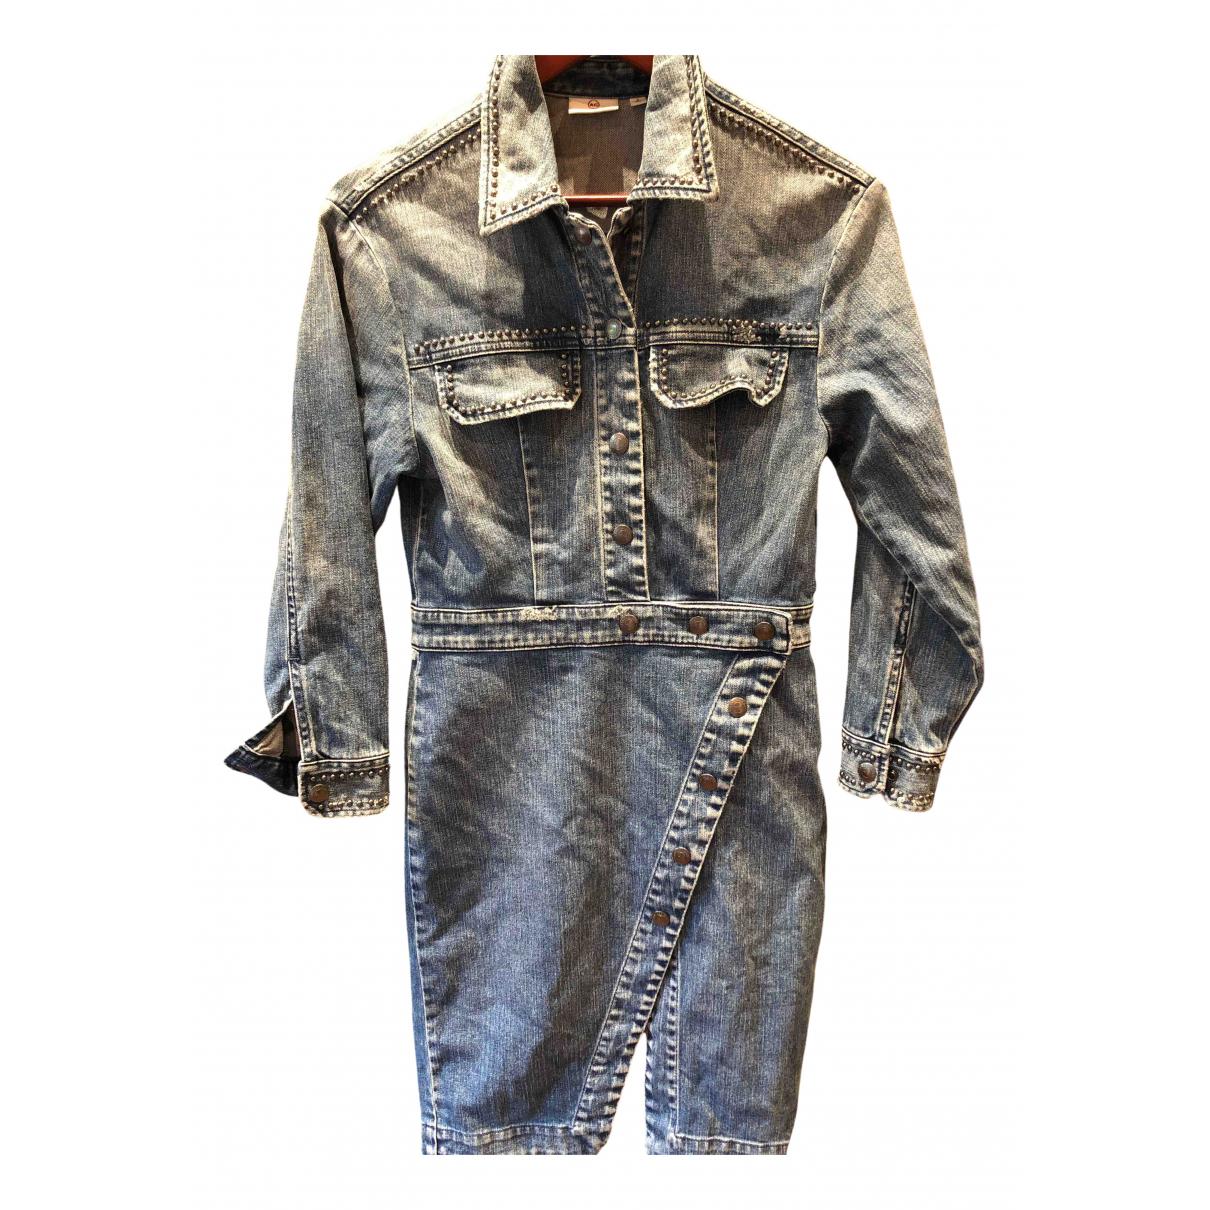 Adriano Goldschmied \N Cotton - elasthane dress for Women S International